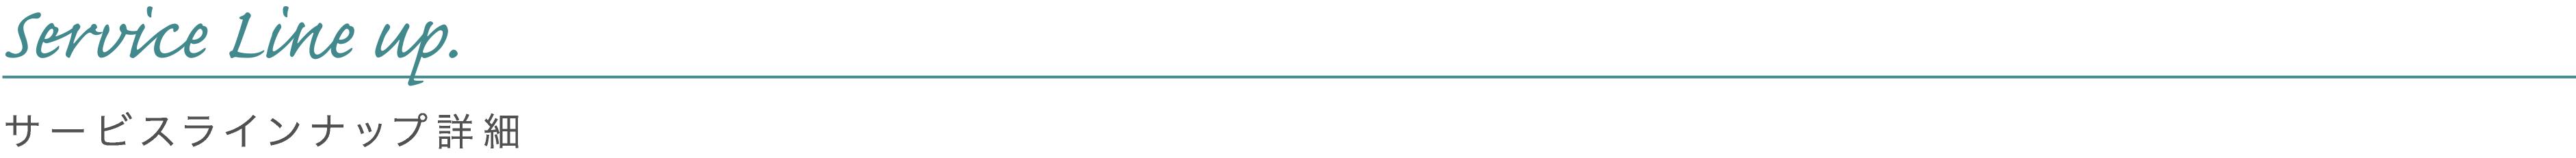 Service Outline / サービスラインナップ詳細